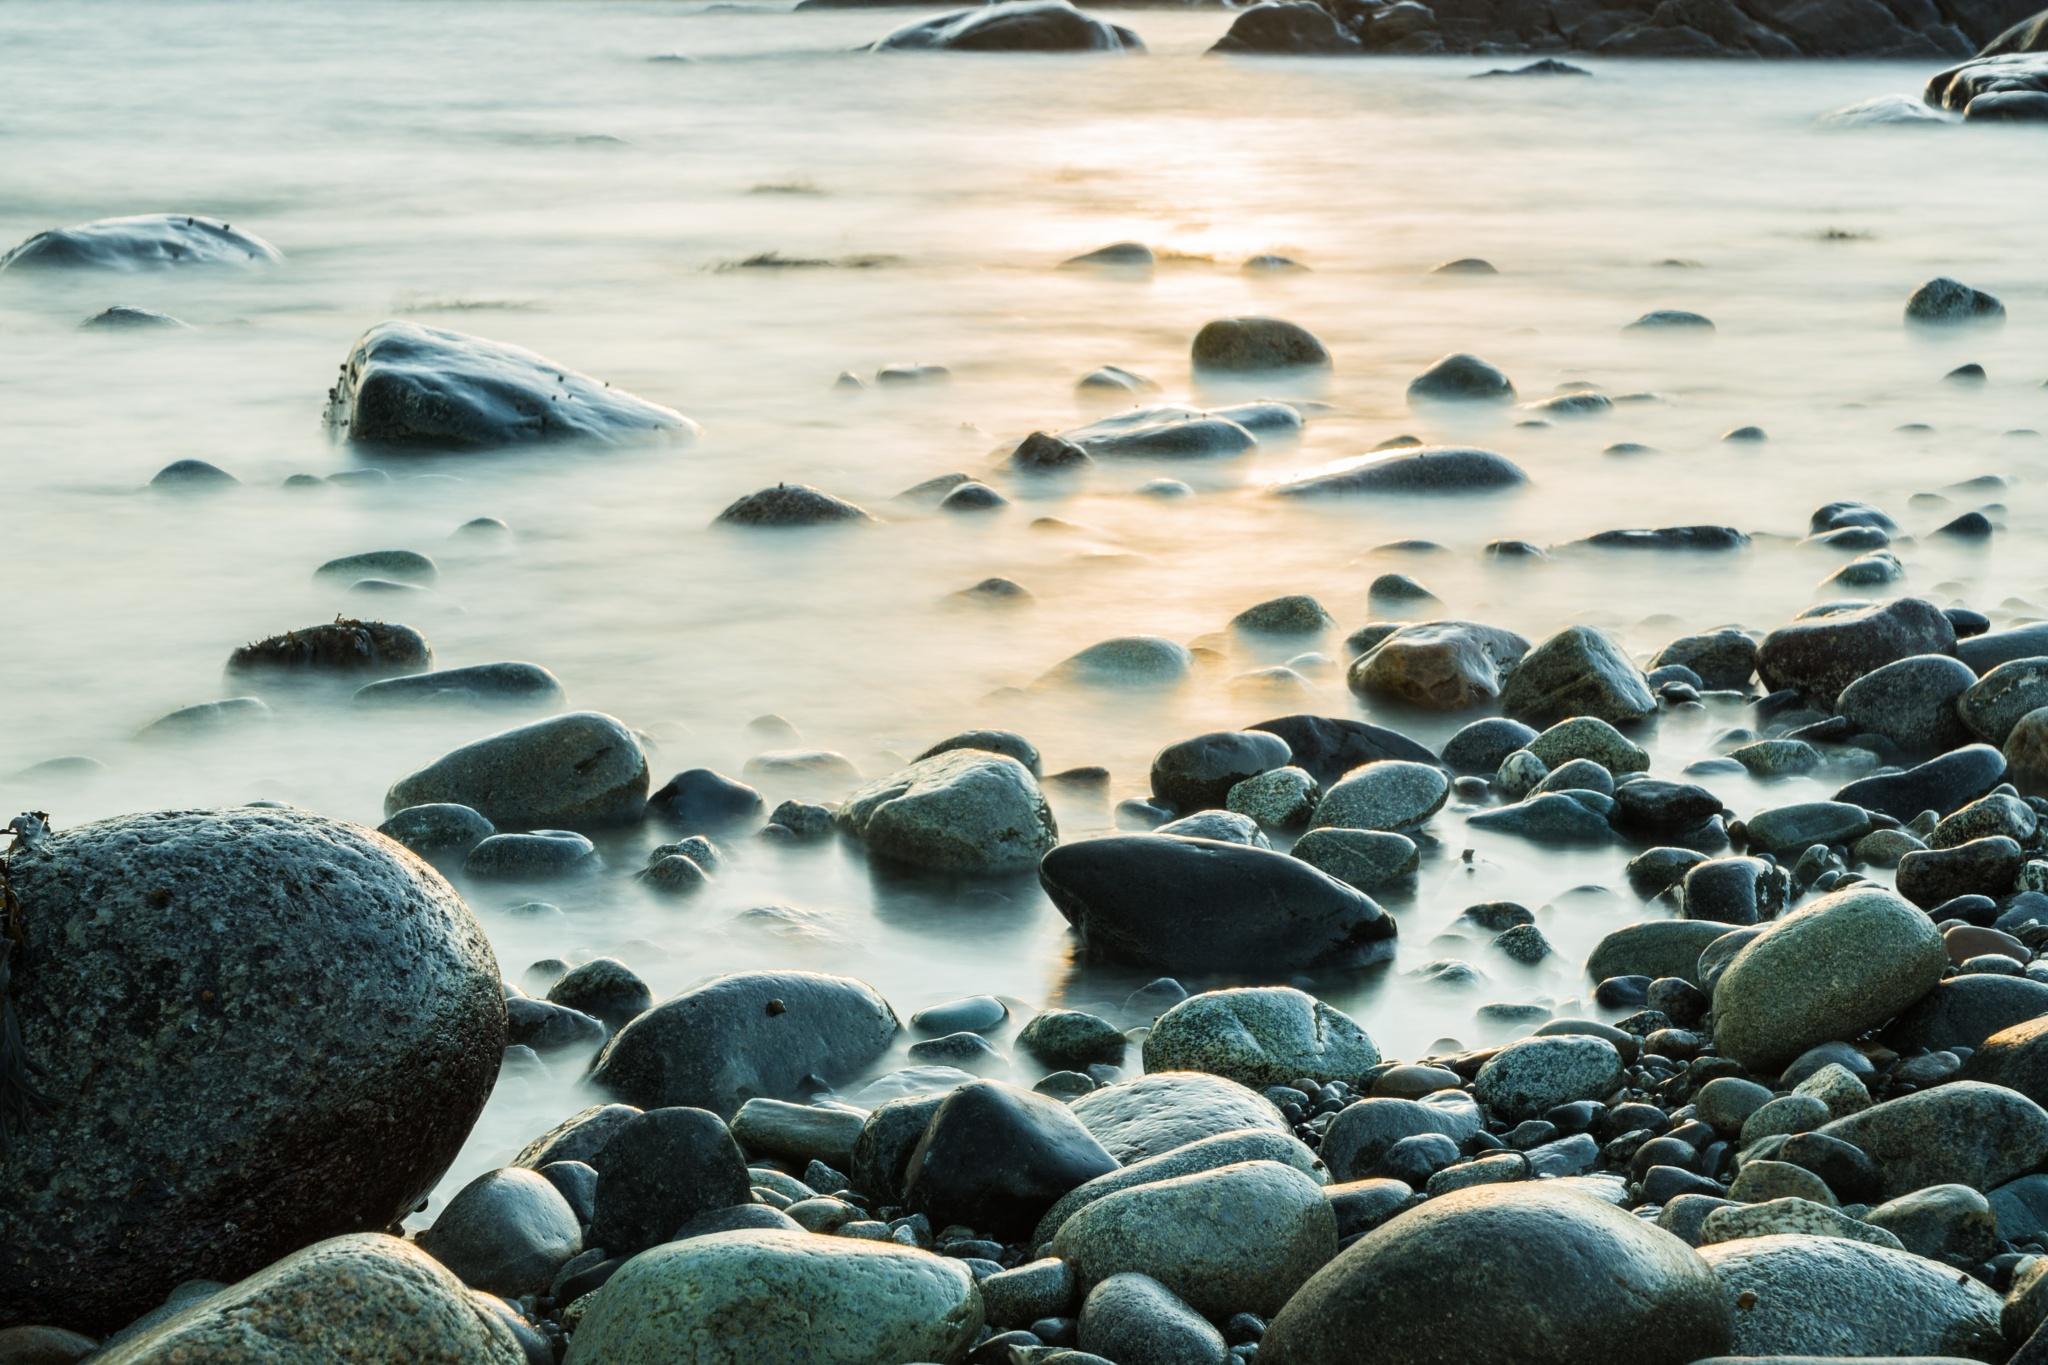 Rocks in sunset by Tormod Lindoe